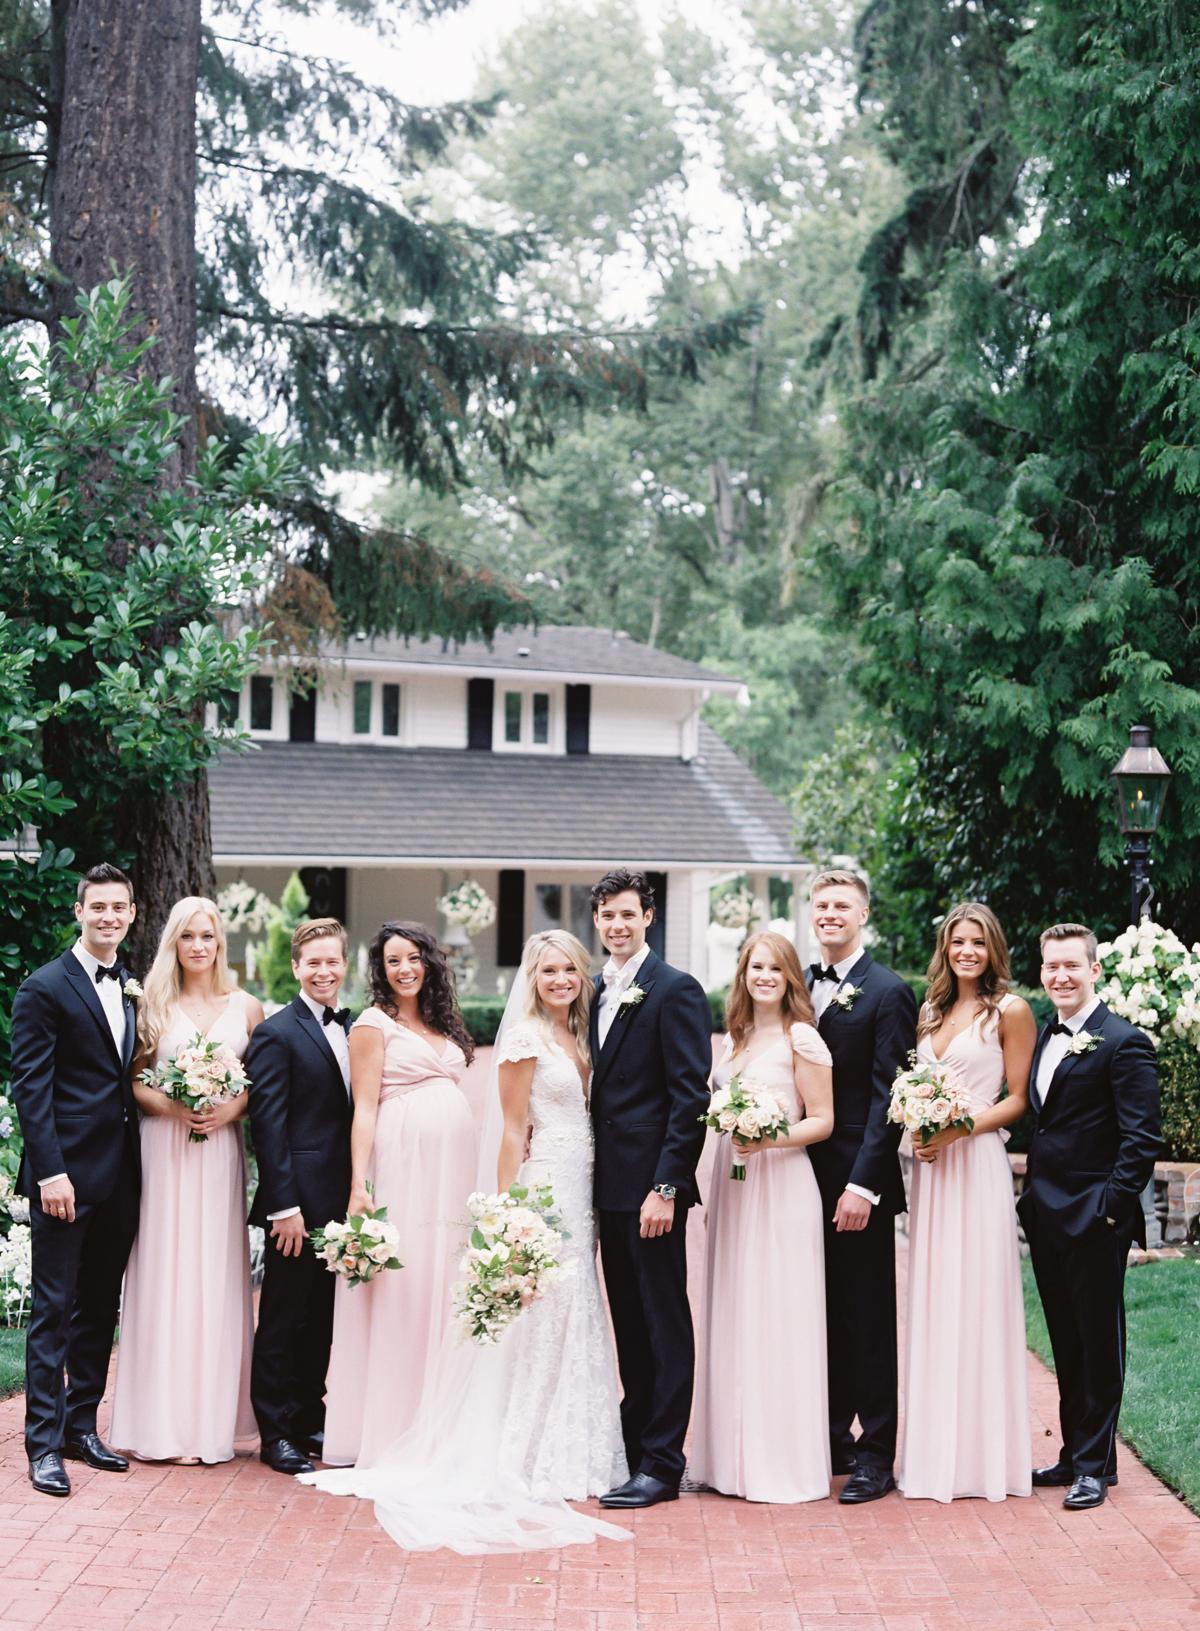 0014 Kirkland Washington Private Estate Wedding Omalley Photographers